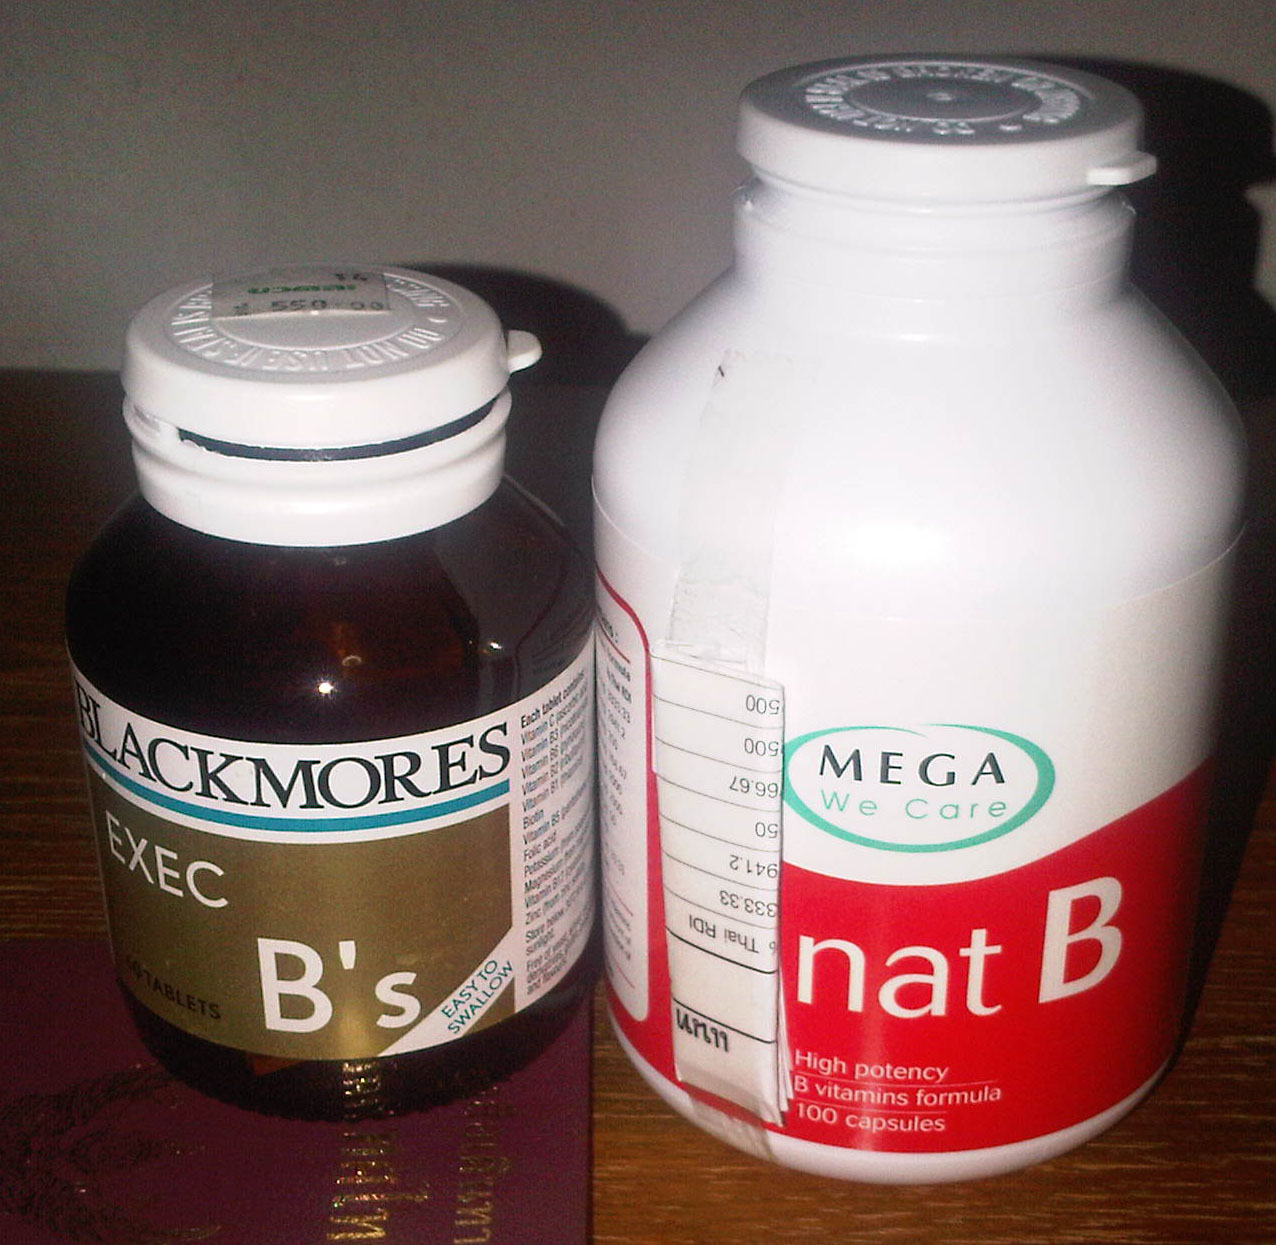 Knowledge Base Vitamin B Complex Blackmore Vs Nat B